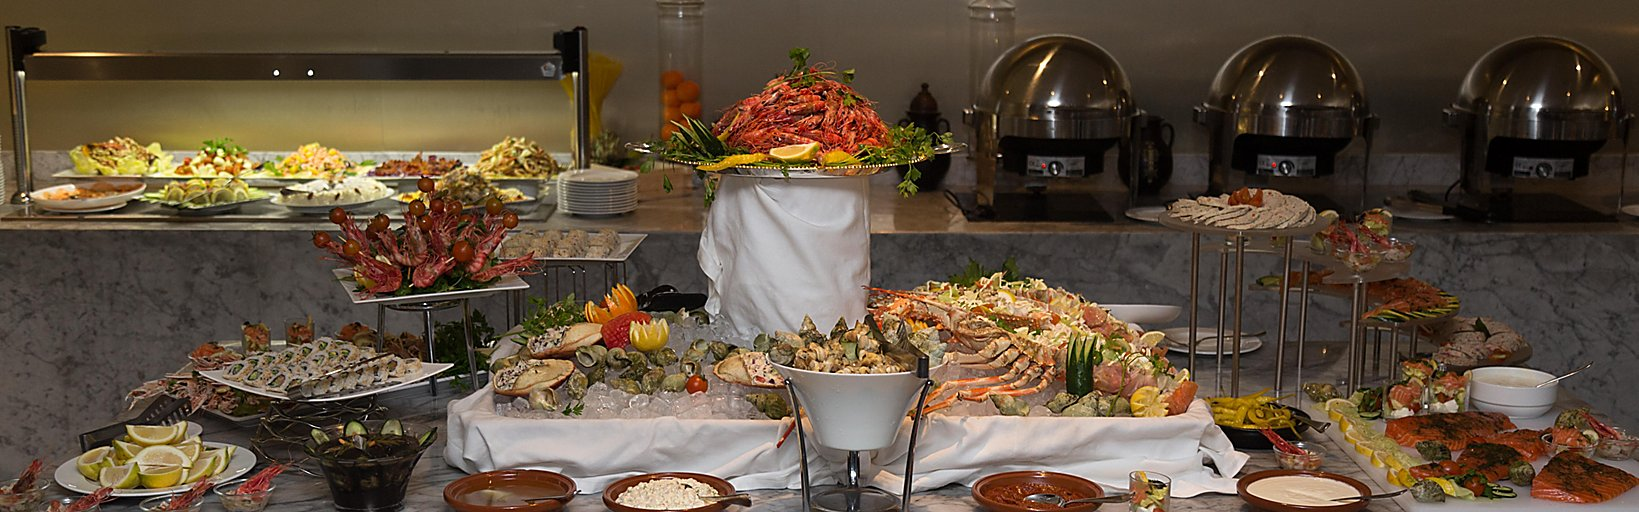 Astonishing Restaurants Near Holiday Inn Algiers Cheraga Tower Interior Design Ideas Skatsoteloinfo